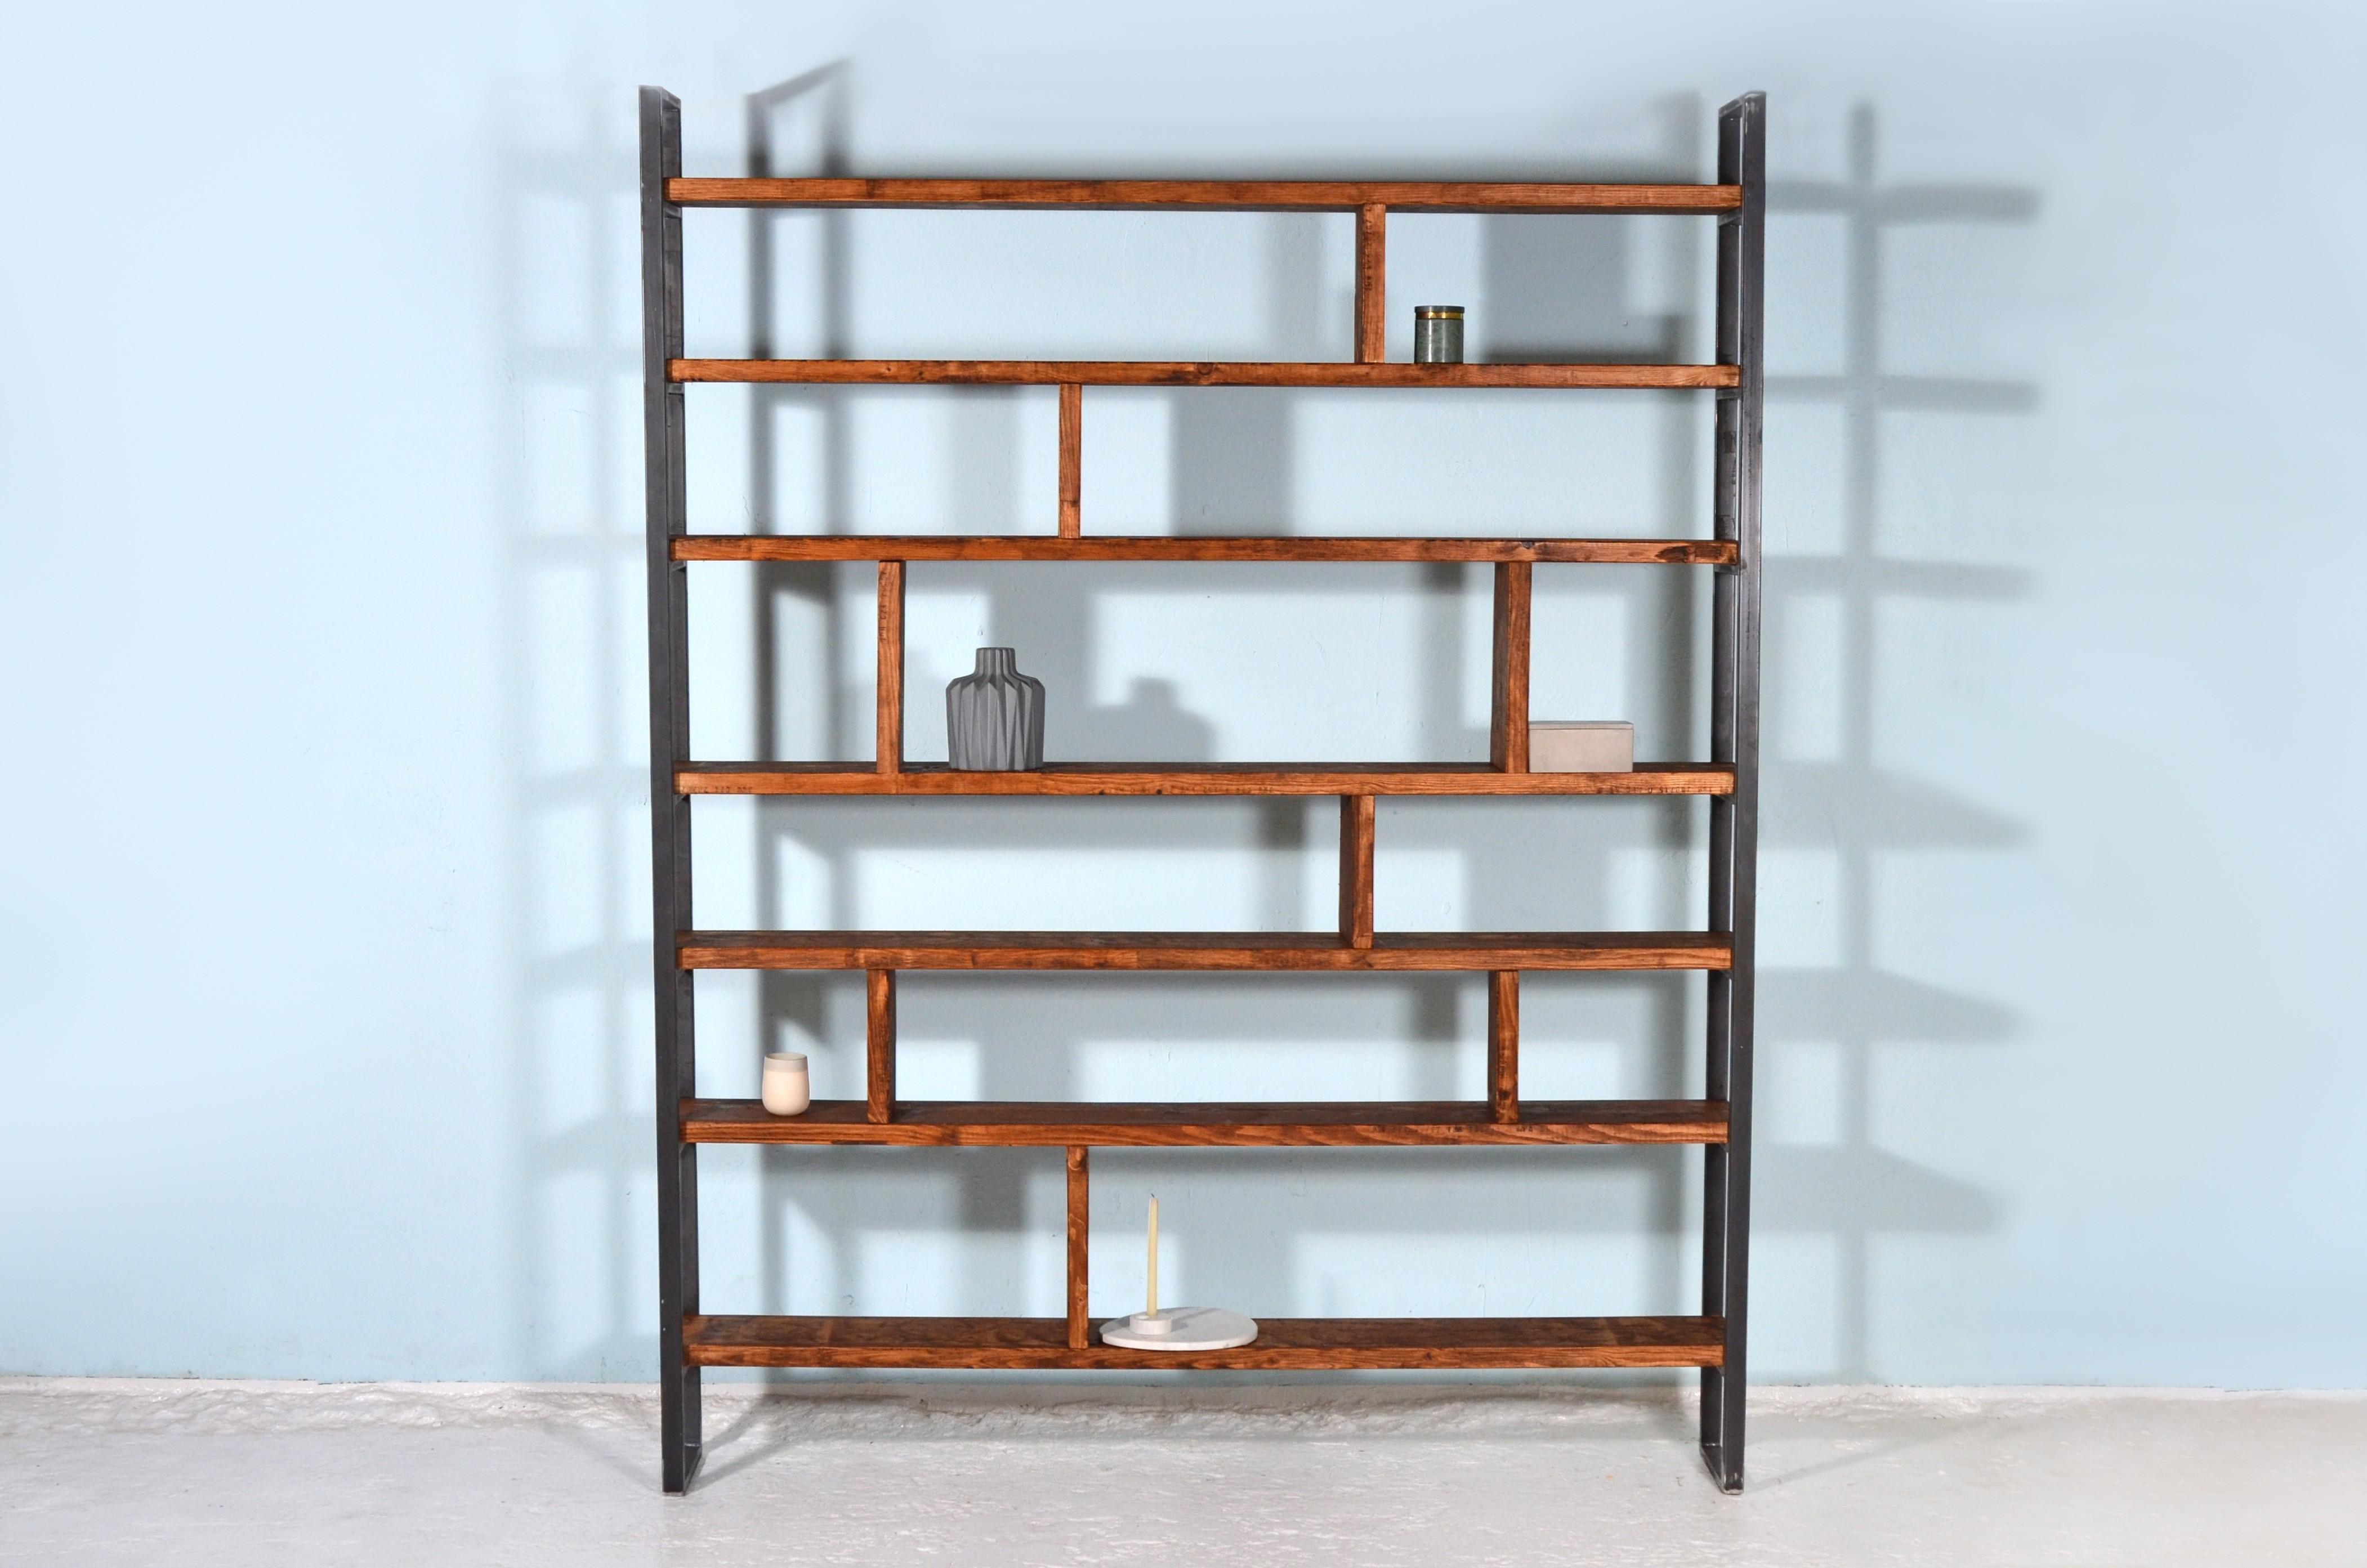 upcycling b cherregal aus ger stbretter eisen susteren zwart. Black Bedroom Furniture Sets. Home Design Ideas